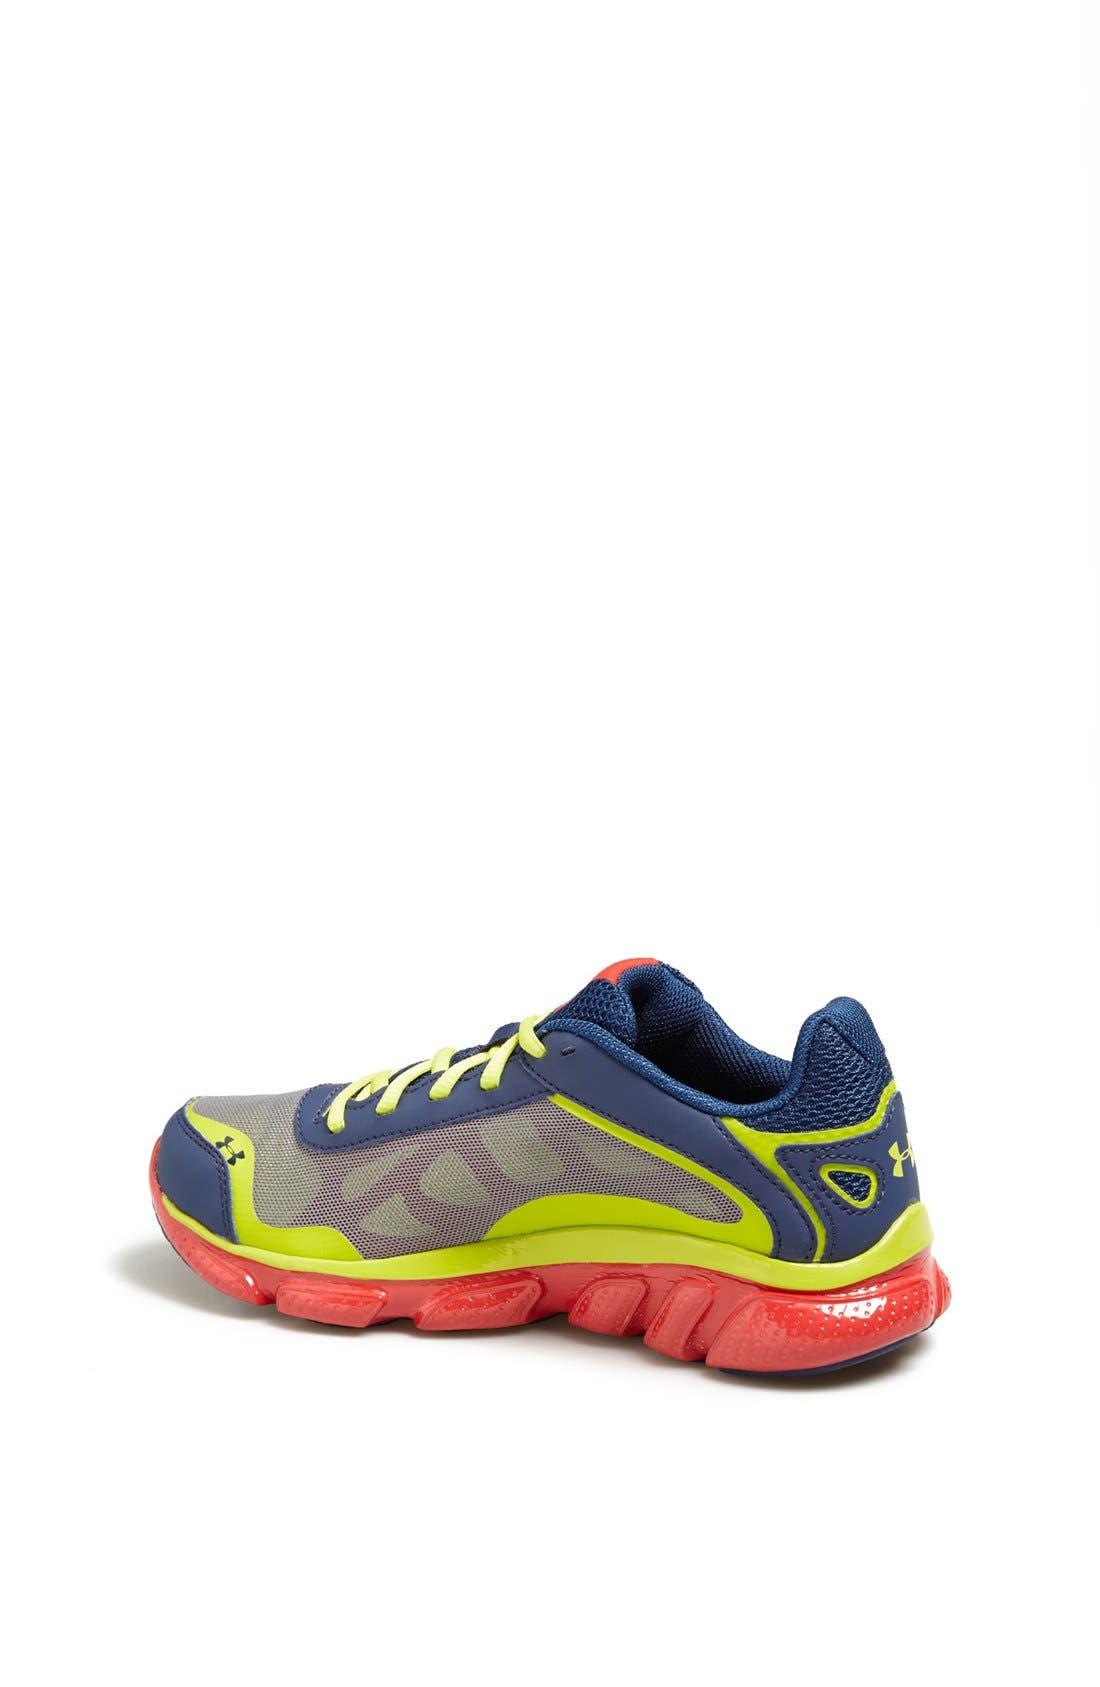 Alternate Image 2  - Under Armour 'Micro G® Pulse' Training Shoe (Toddler, Little Kid & Big Kid)